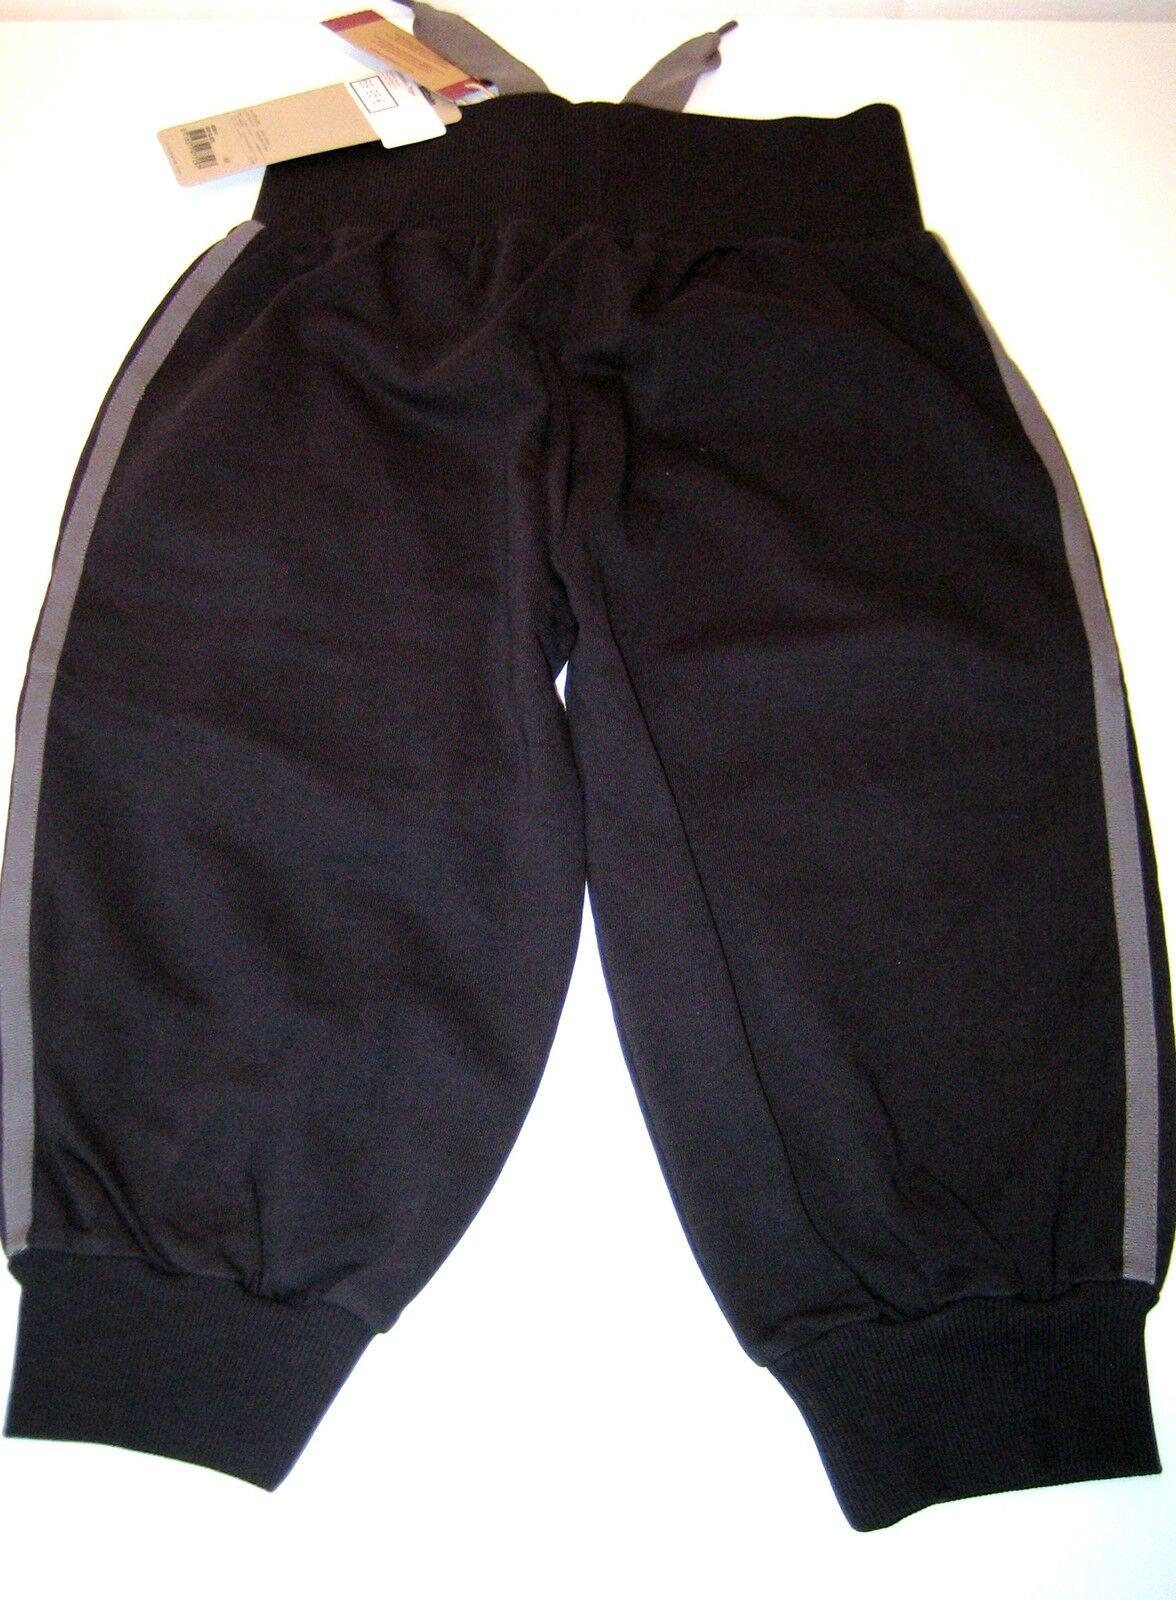 ASICS / ONITSUKA Tiger Damen Jogging Hose Größe XS schwarz NEU Trainings Hose